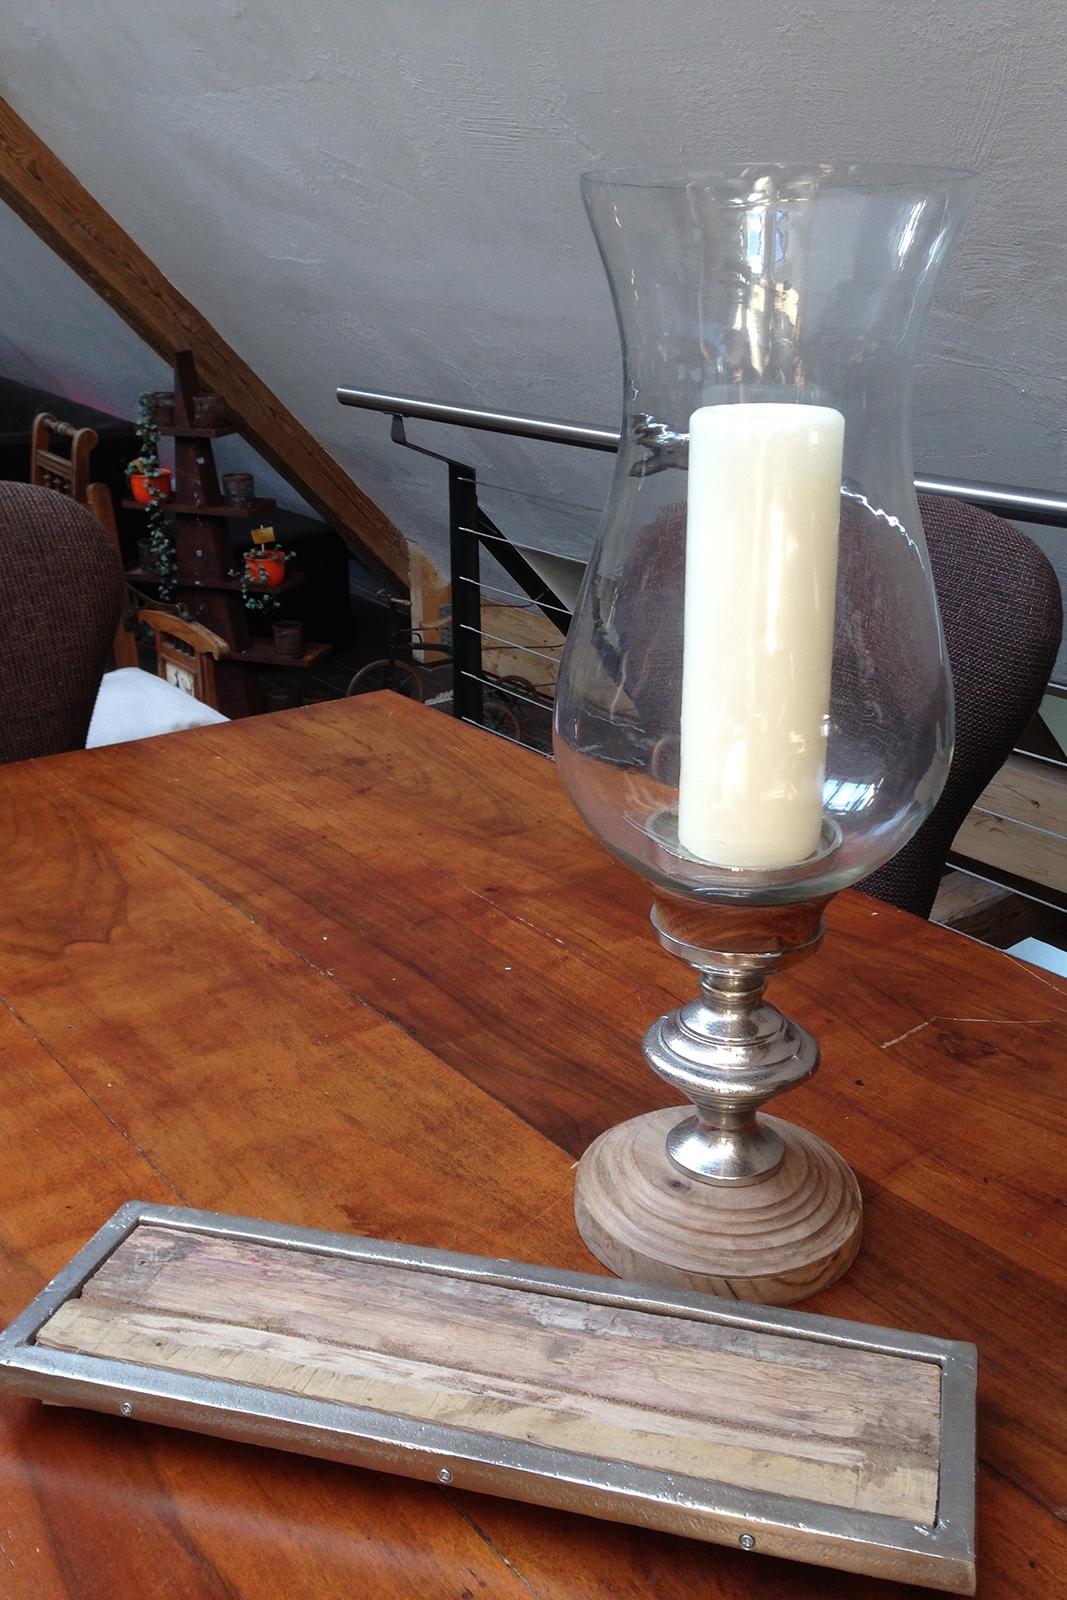 Untersetzer Holz-Metall 094413 / Kerzenglas 094418